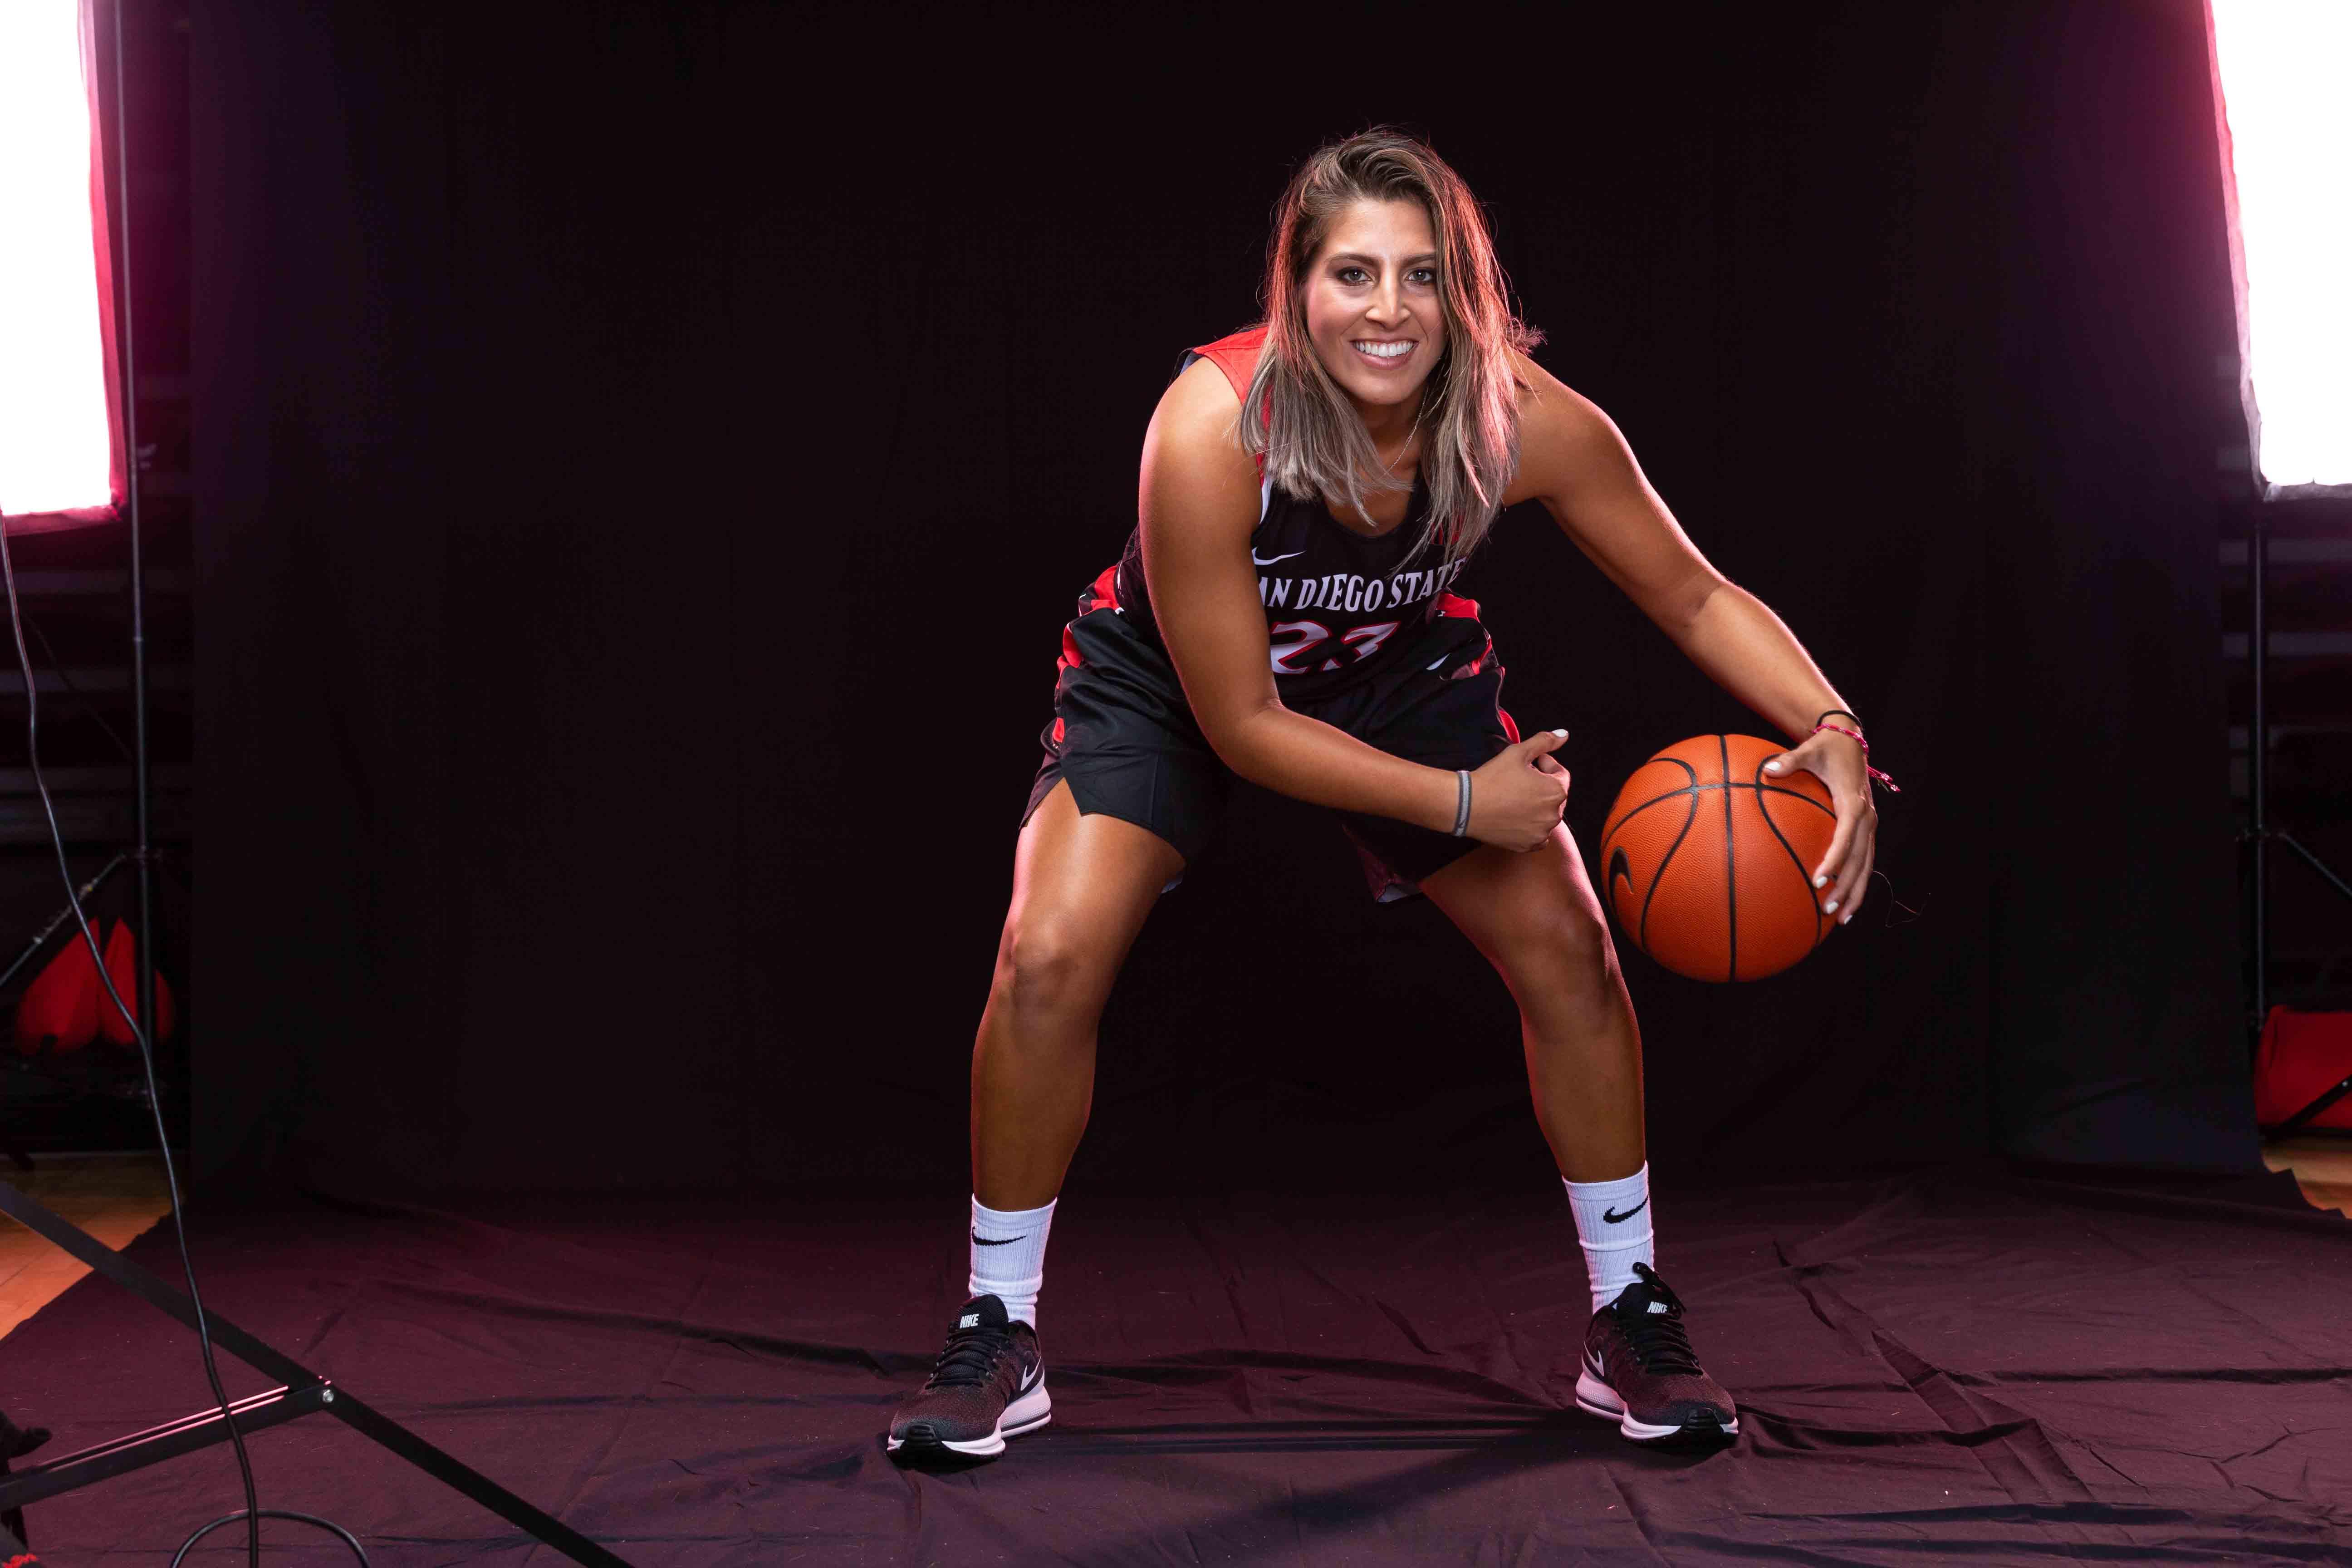 Lili Gomez dribbling a basketball.